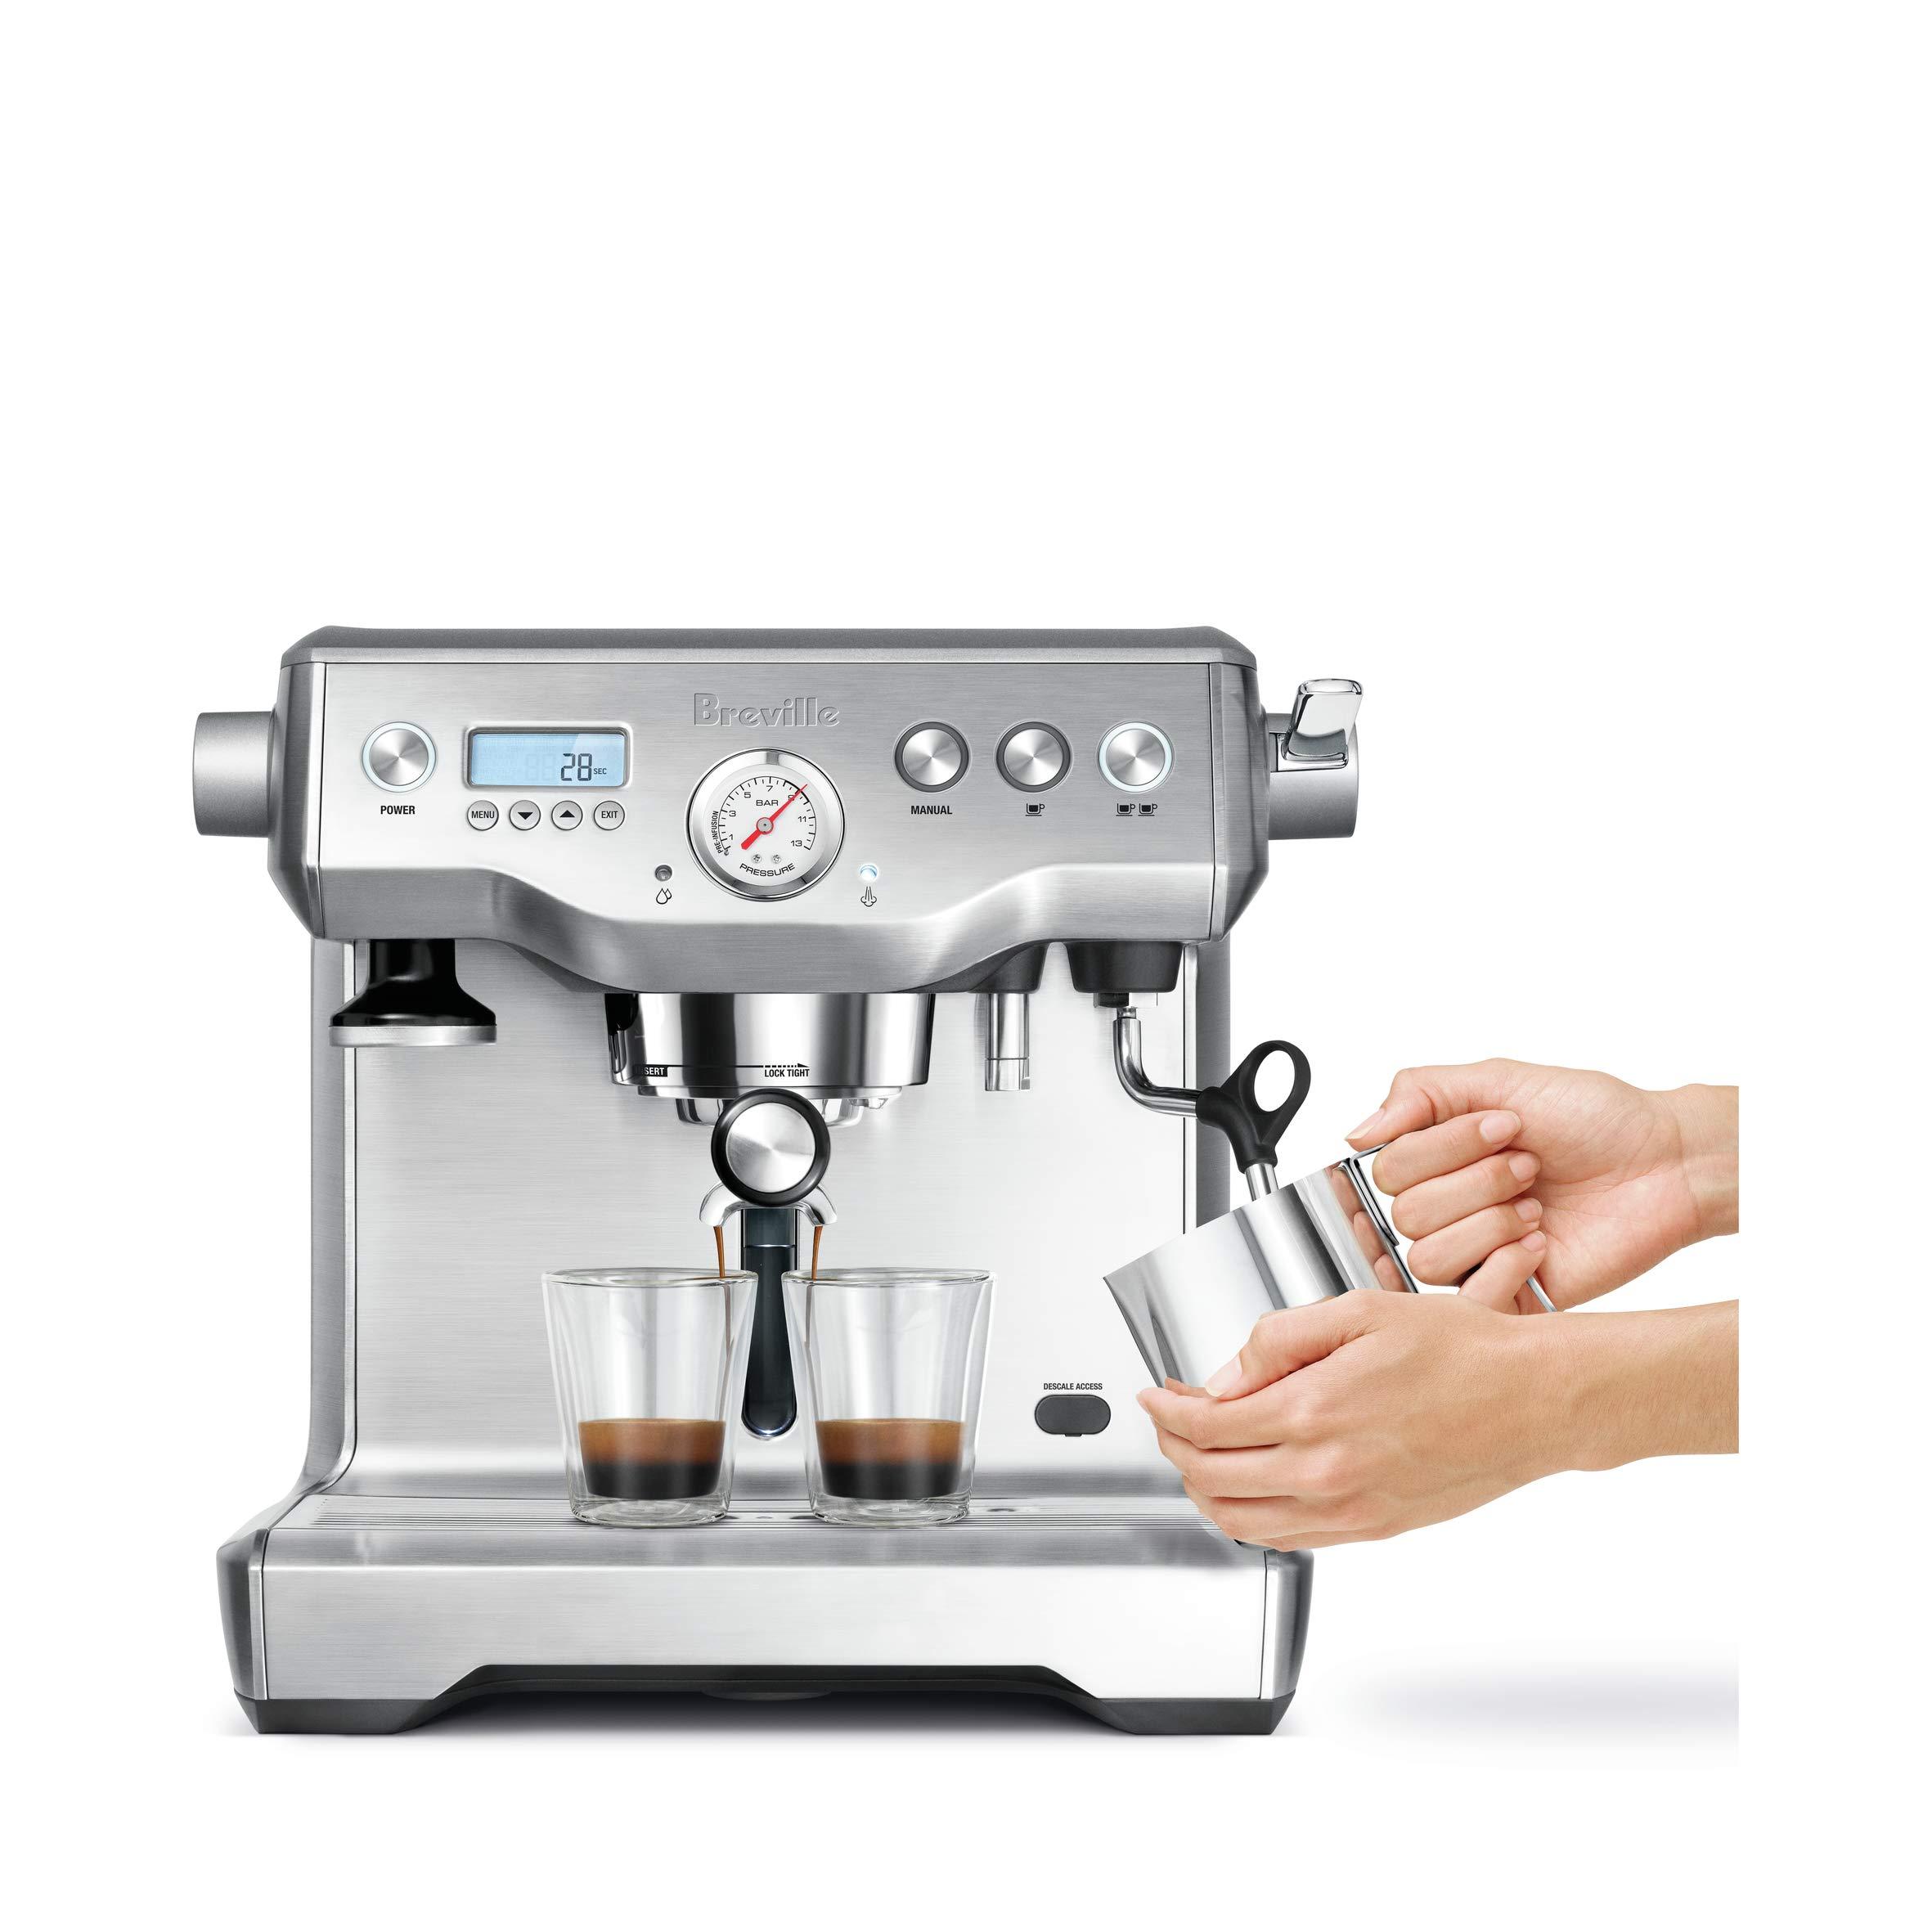 Breville BES920XL Máquina espresso - Cafetera (Máquina espresso ...